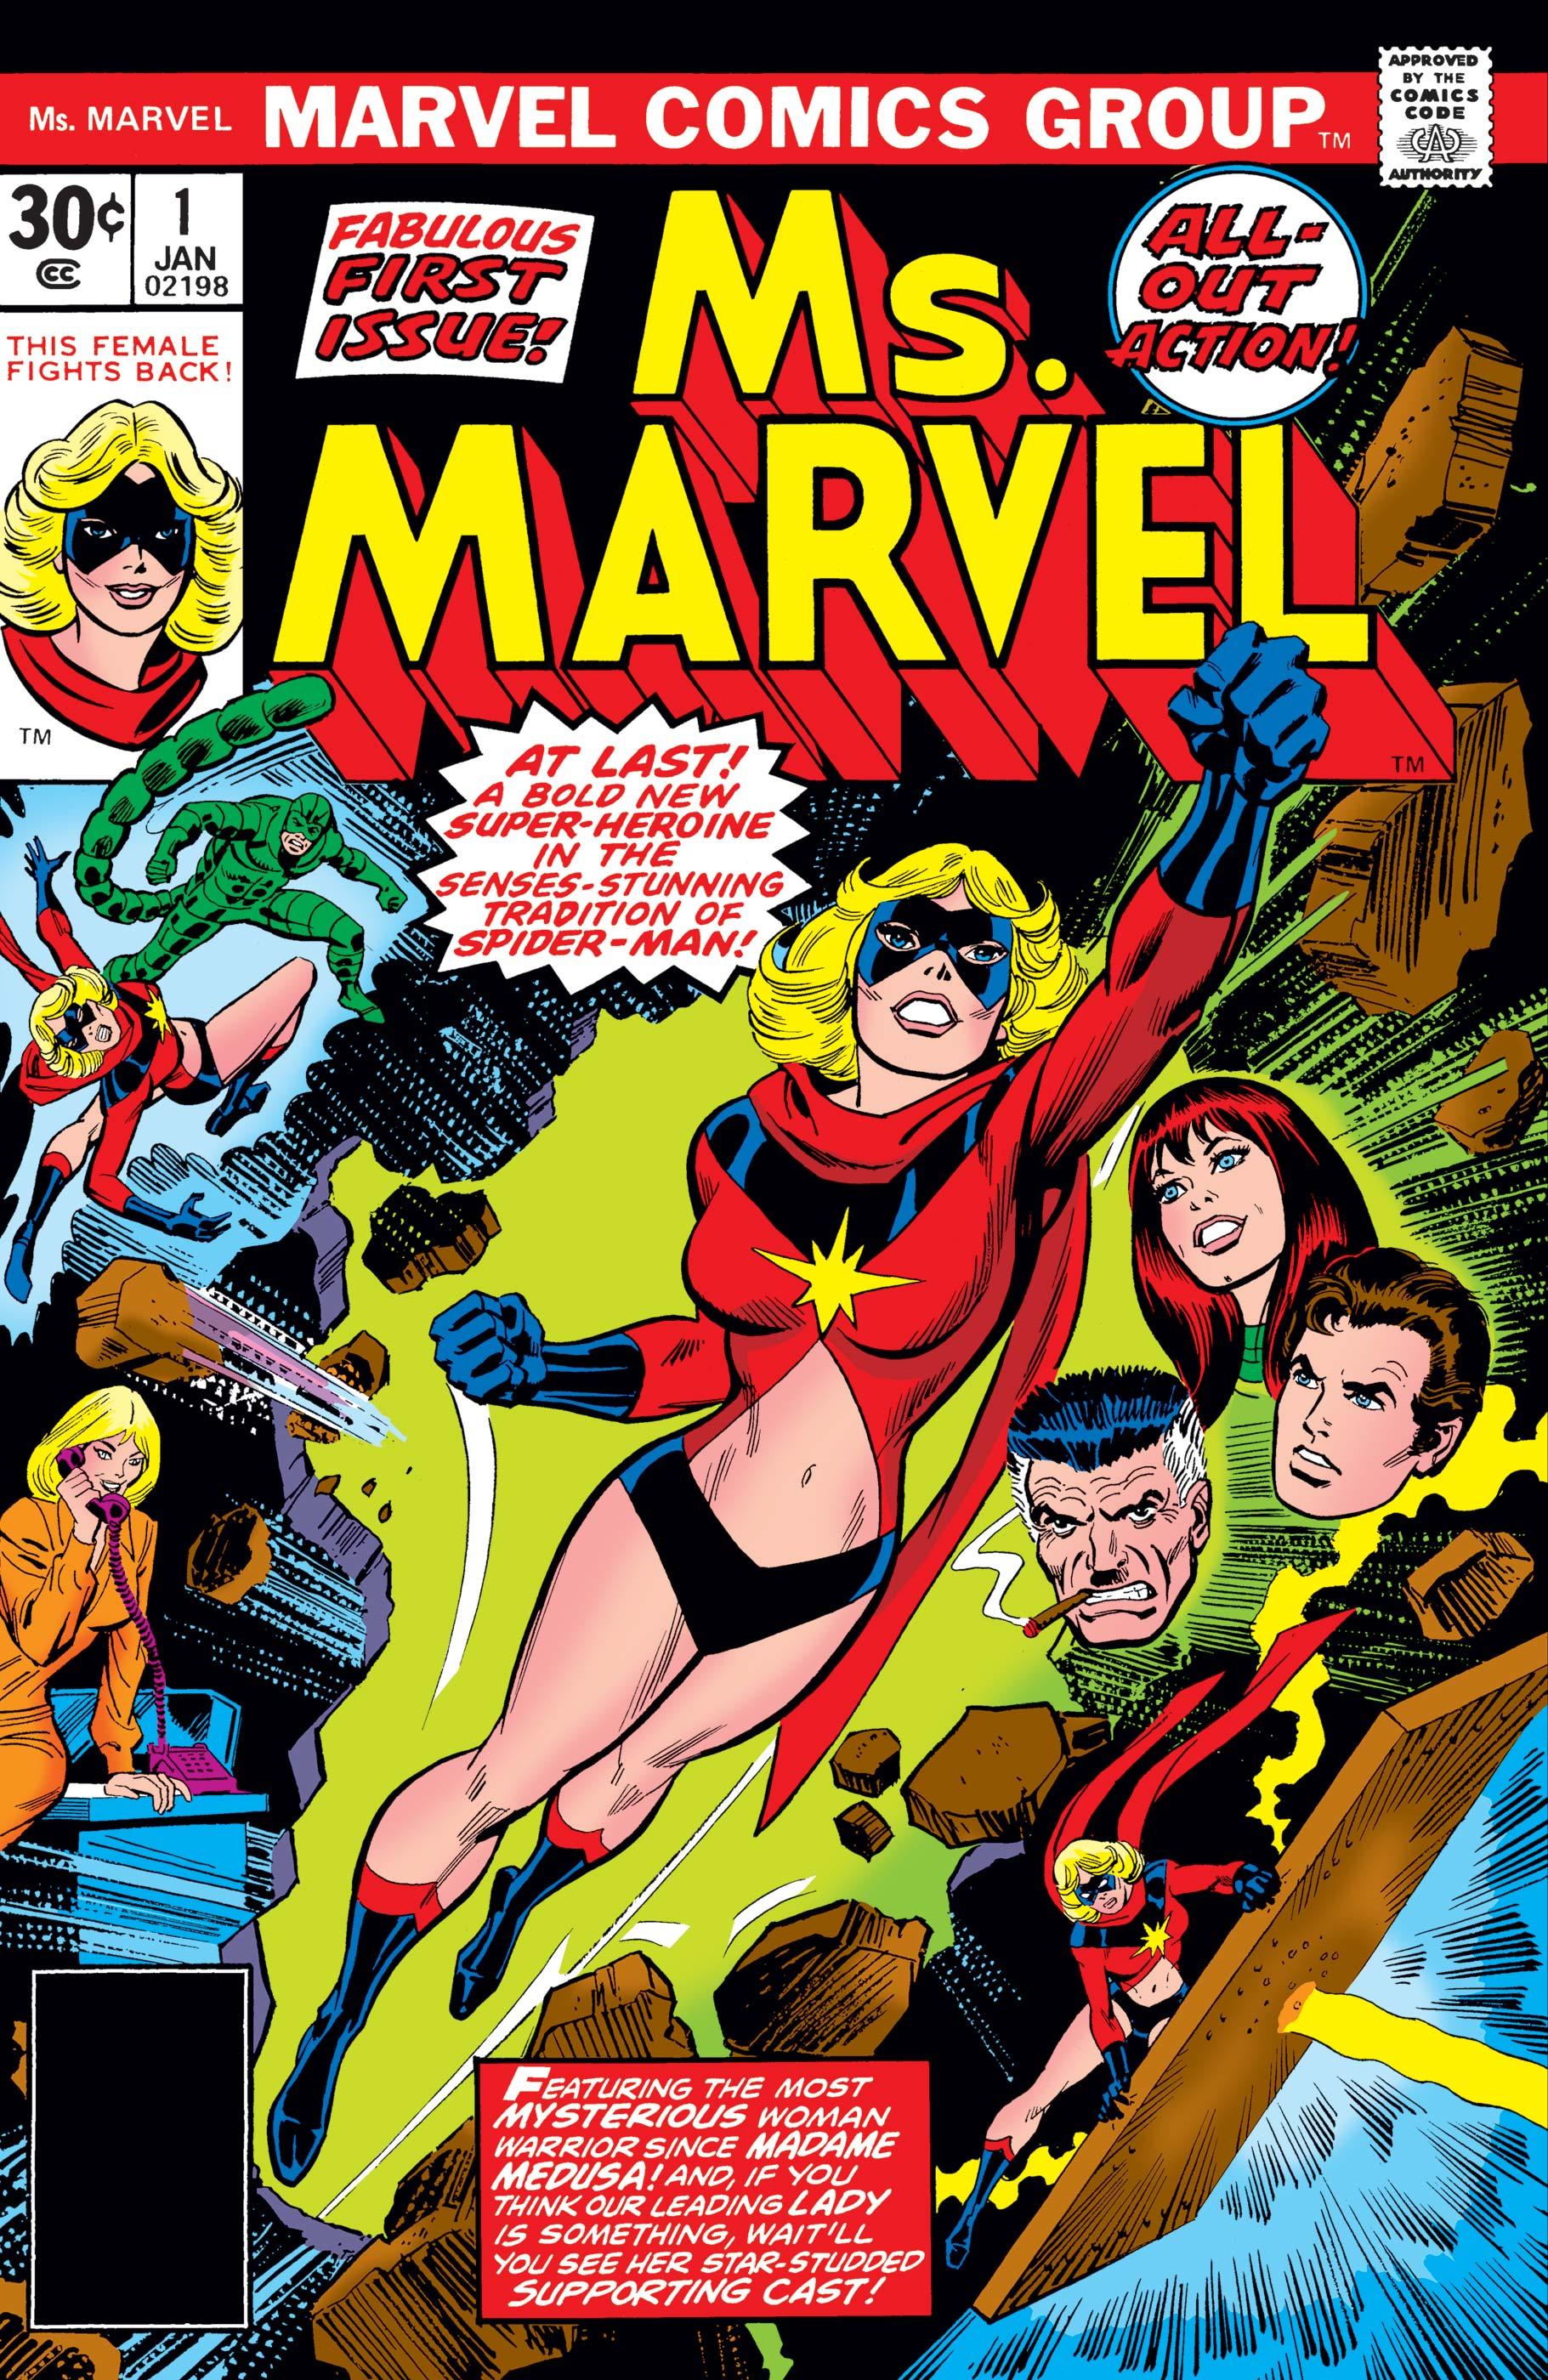 CAROL DANVERS DA MS. MARVEL A CAPITAN MARVEL